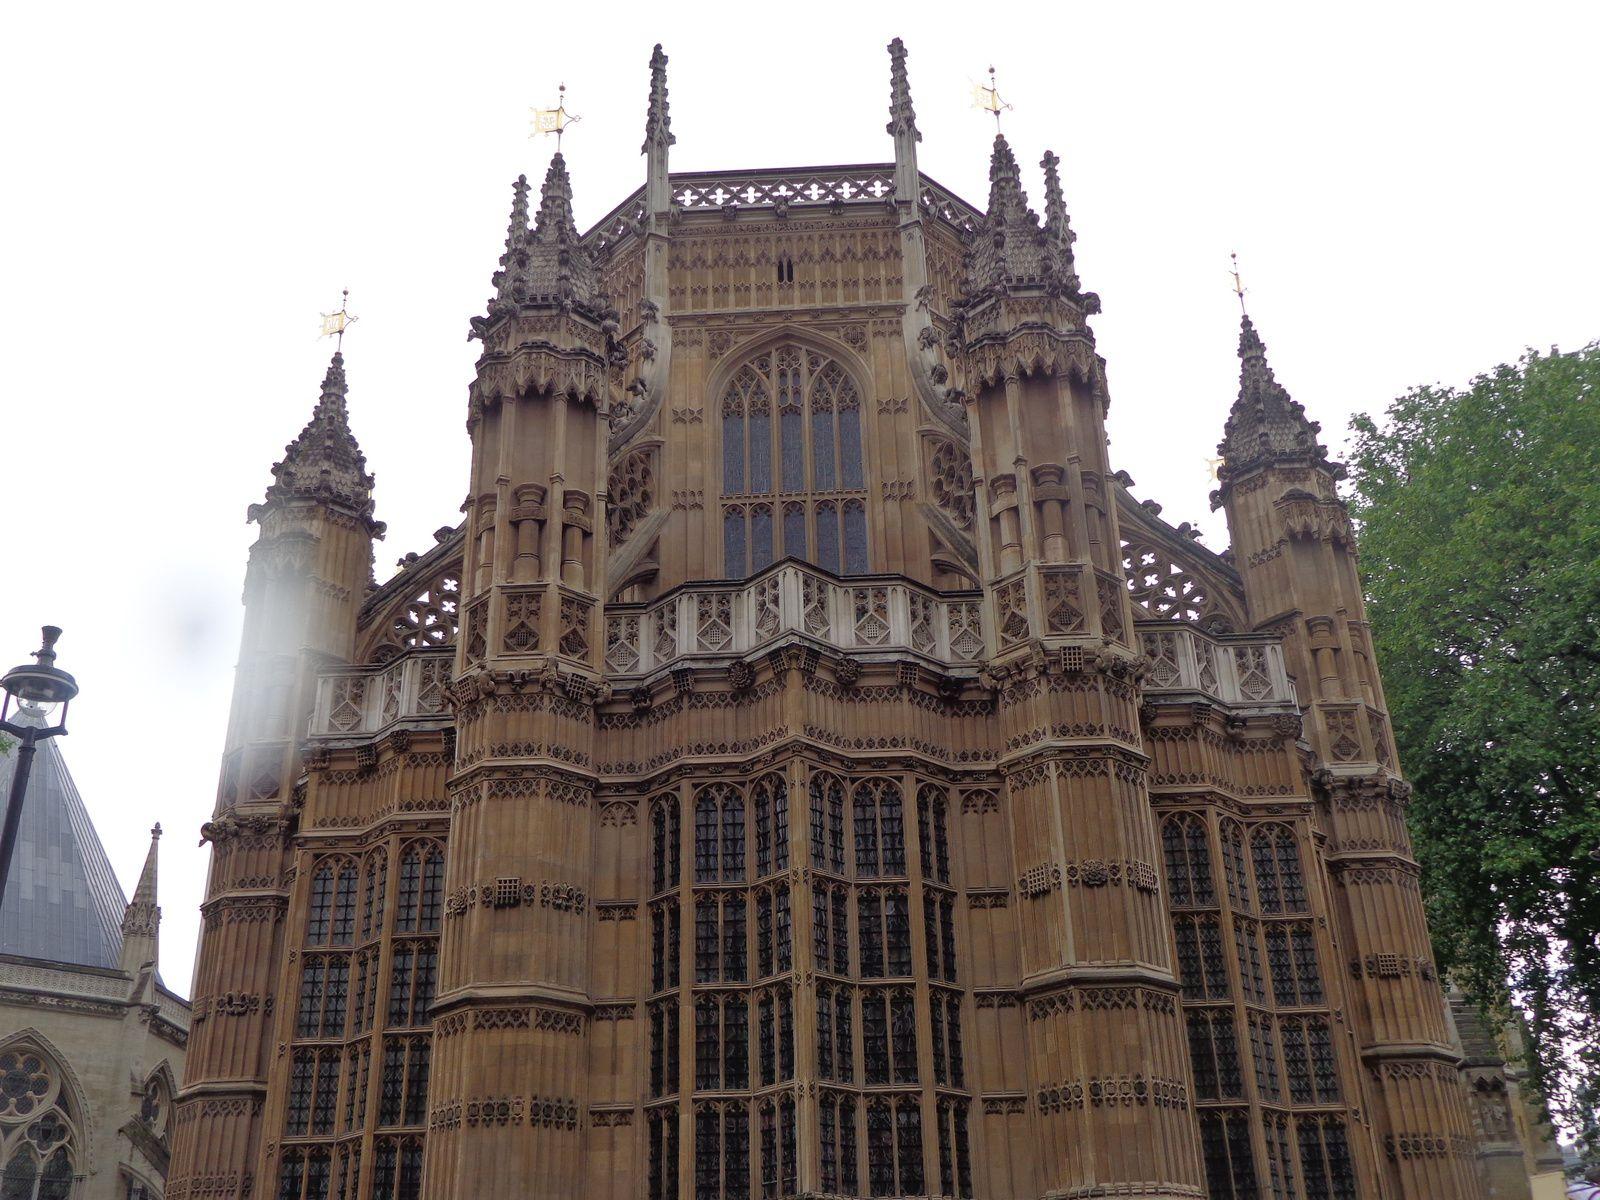 Vacances londoniennes (2)